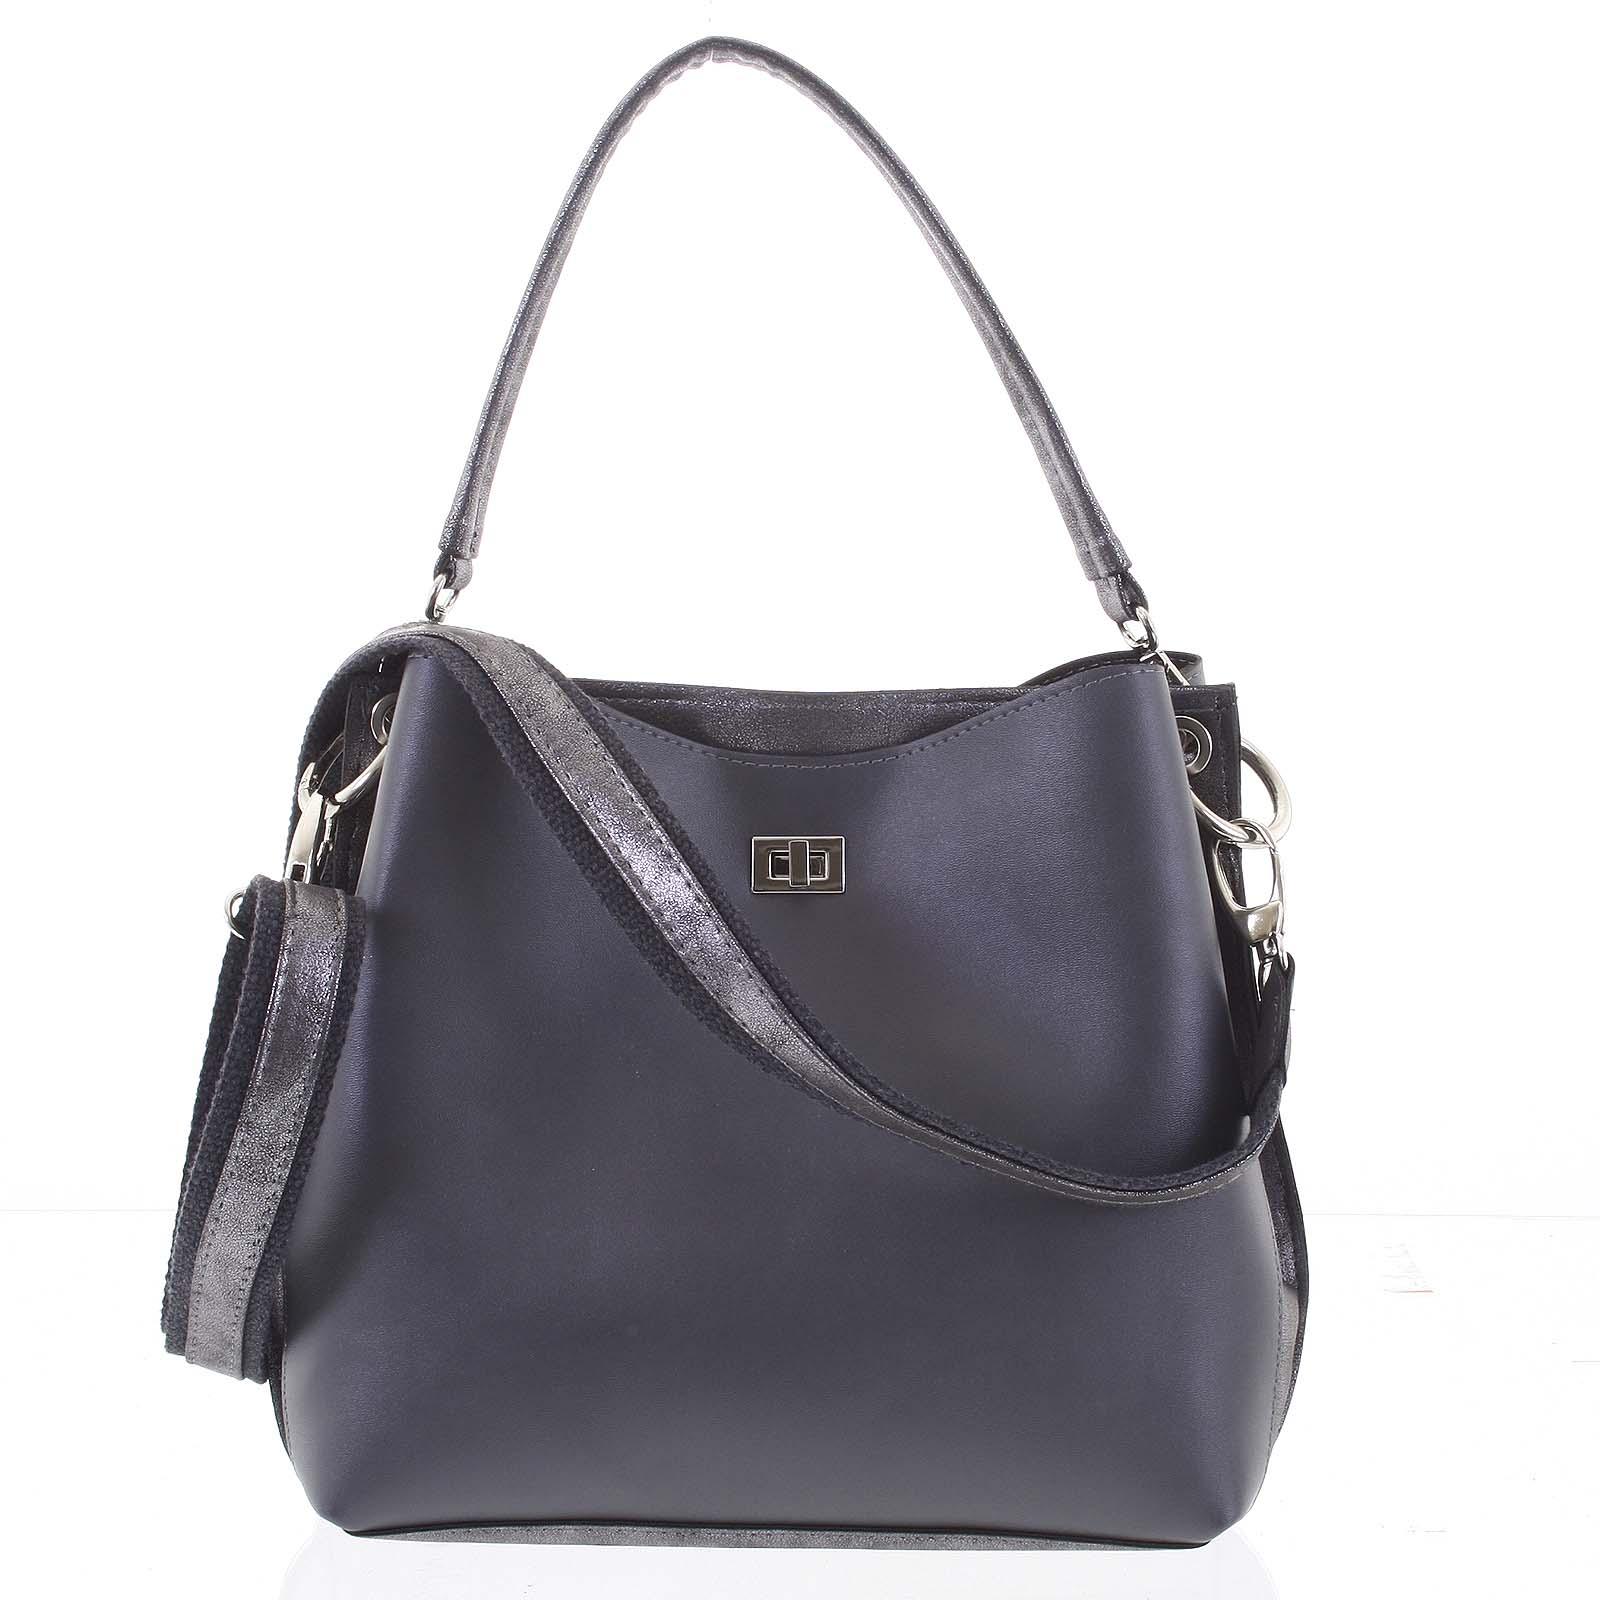 Moderná dámska kabelka sivá - Delami Trecia